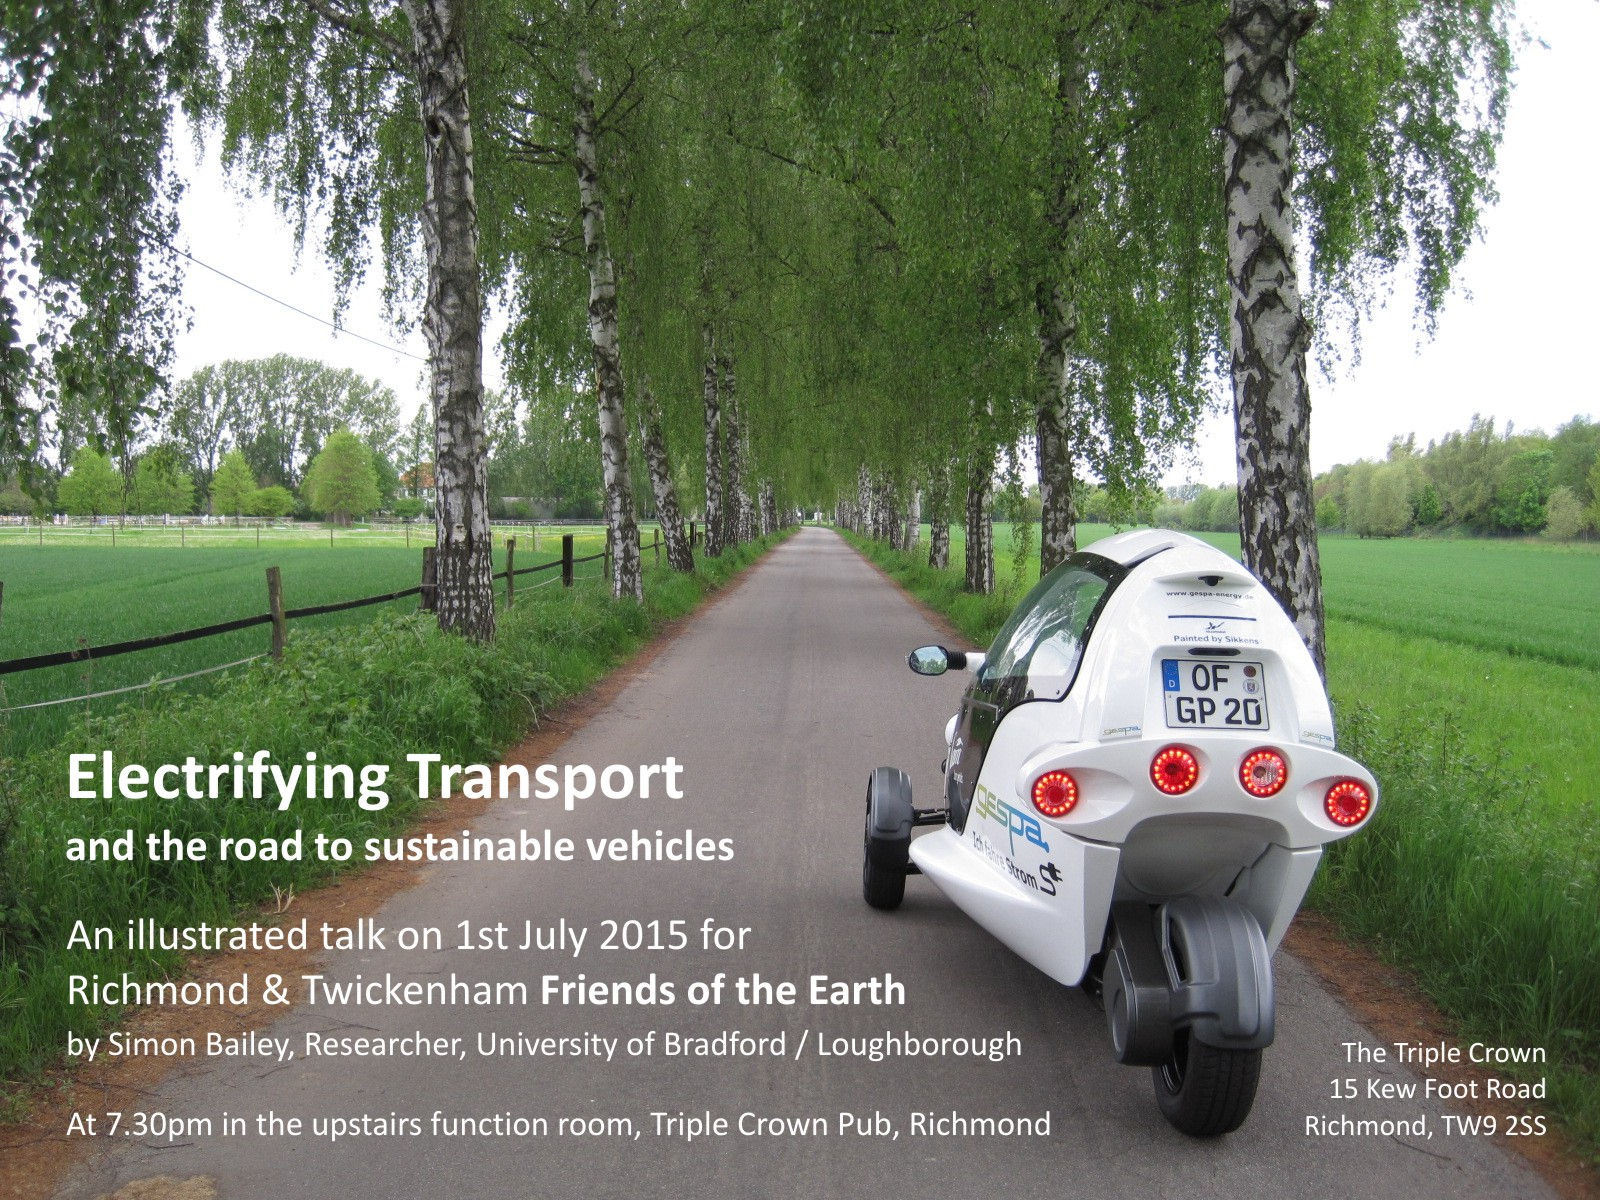 Electryfying Transport Talk 1st July